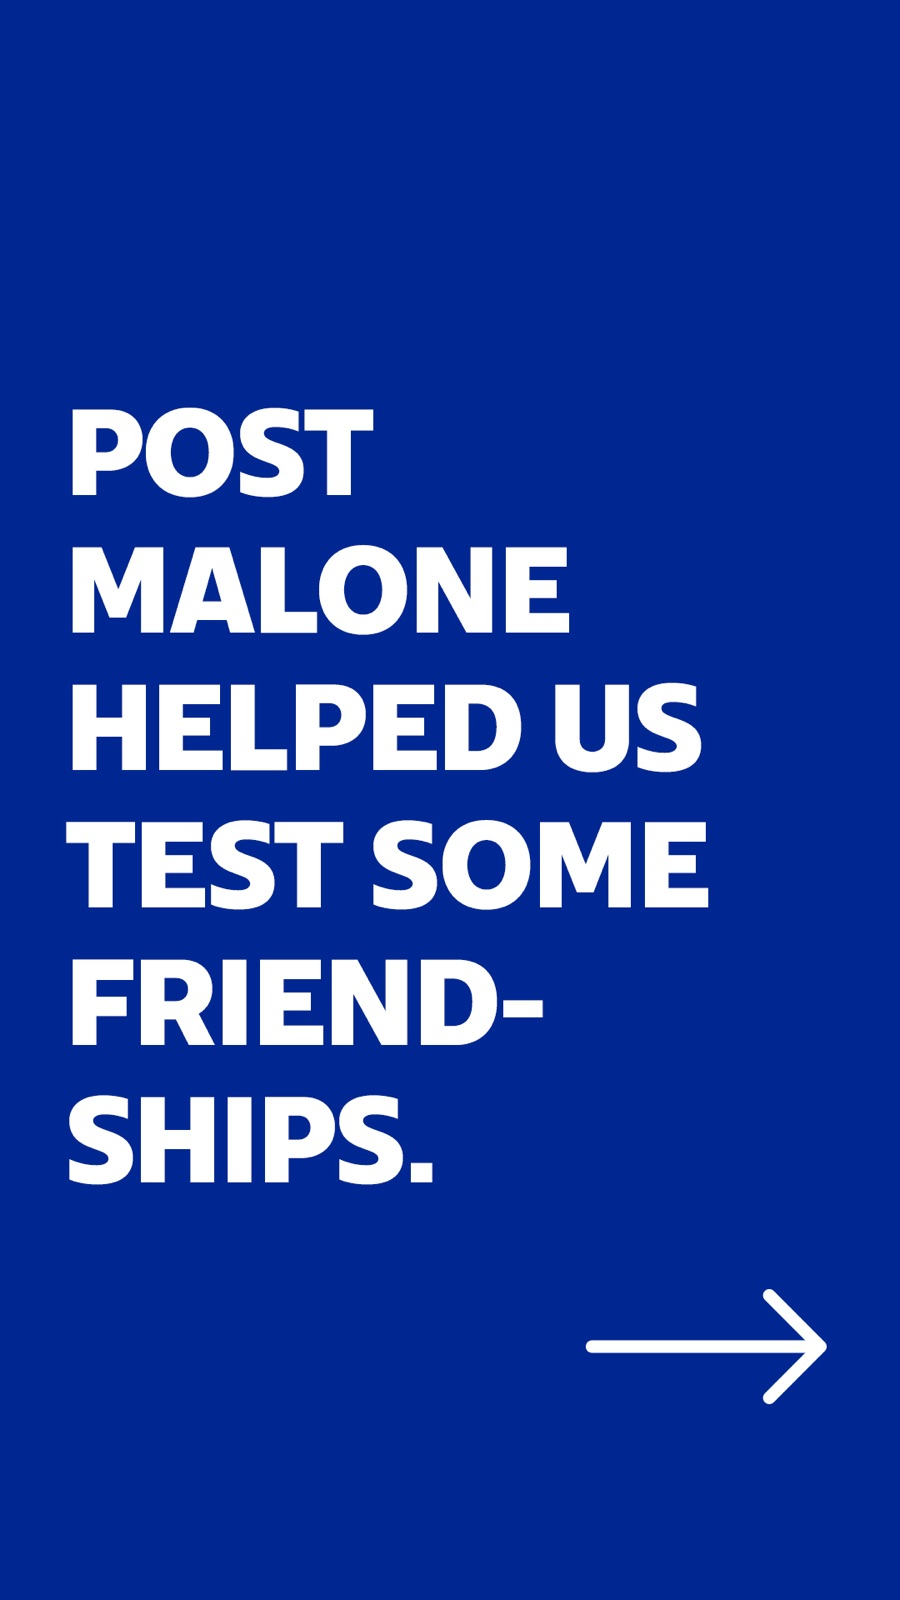 001_PostMaloneHelpedUsTestSomeFriendships.jpg.jpeg